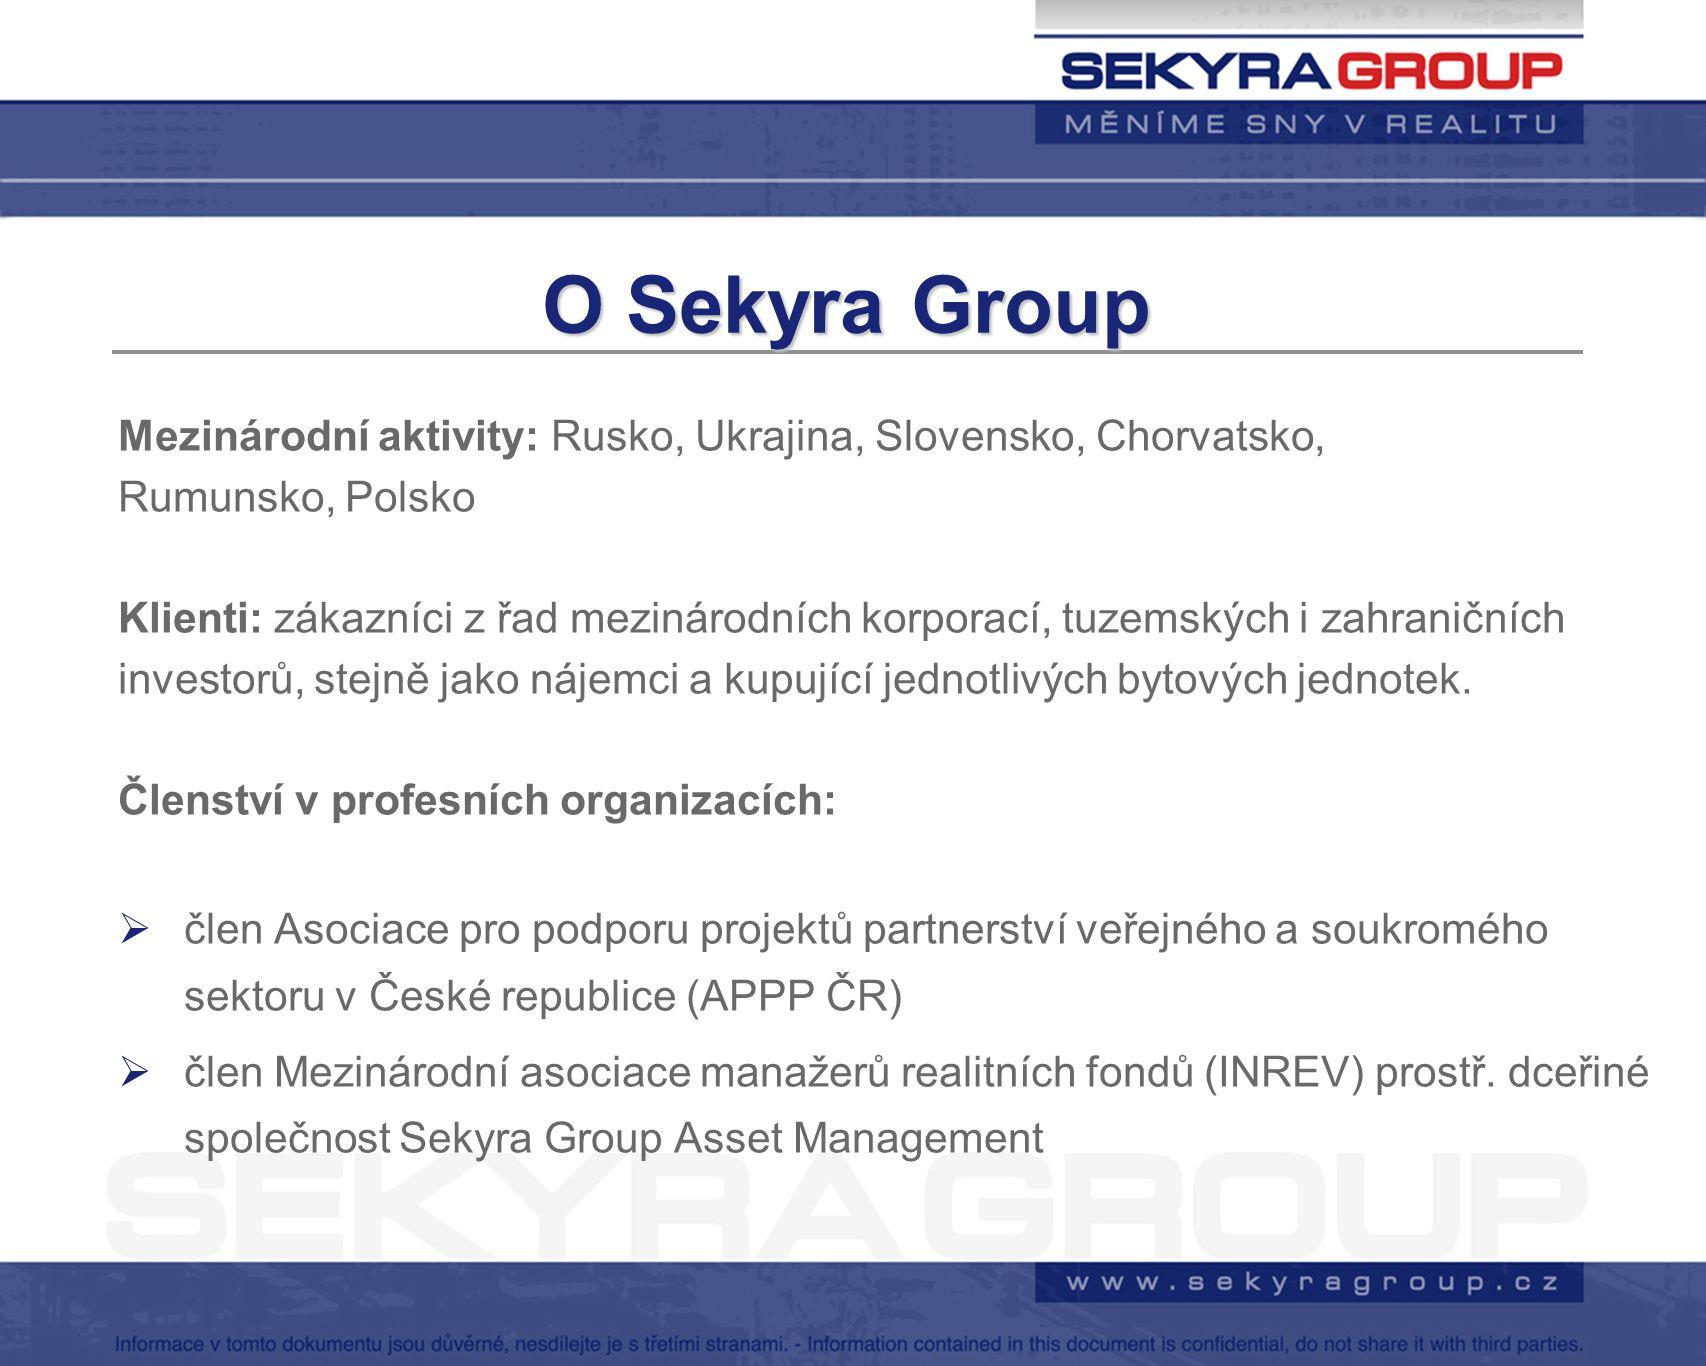 O Sekyra Group Mezinárodní aktivity: Rusko, Ukrajina, Slovensko, Chorvatsko, Rumunsko, Polsko.